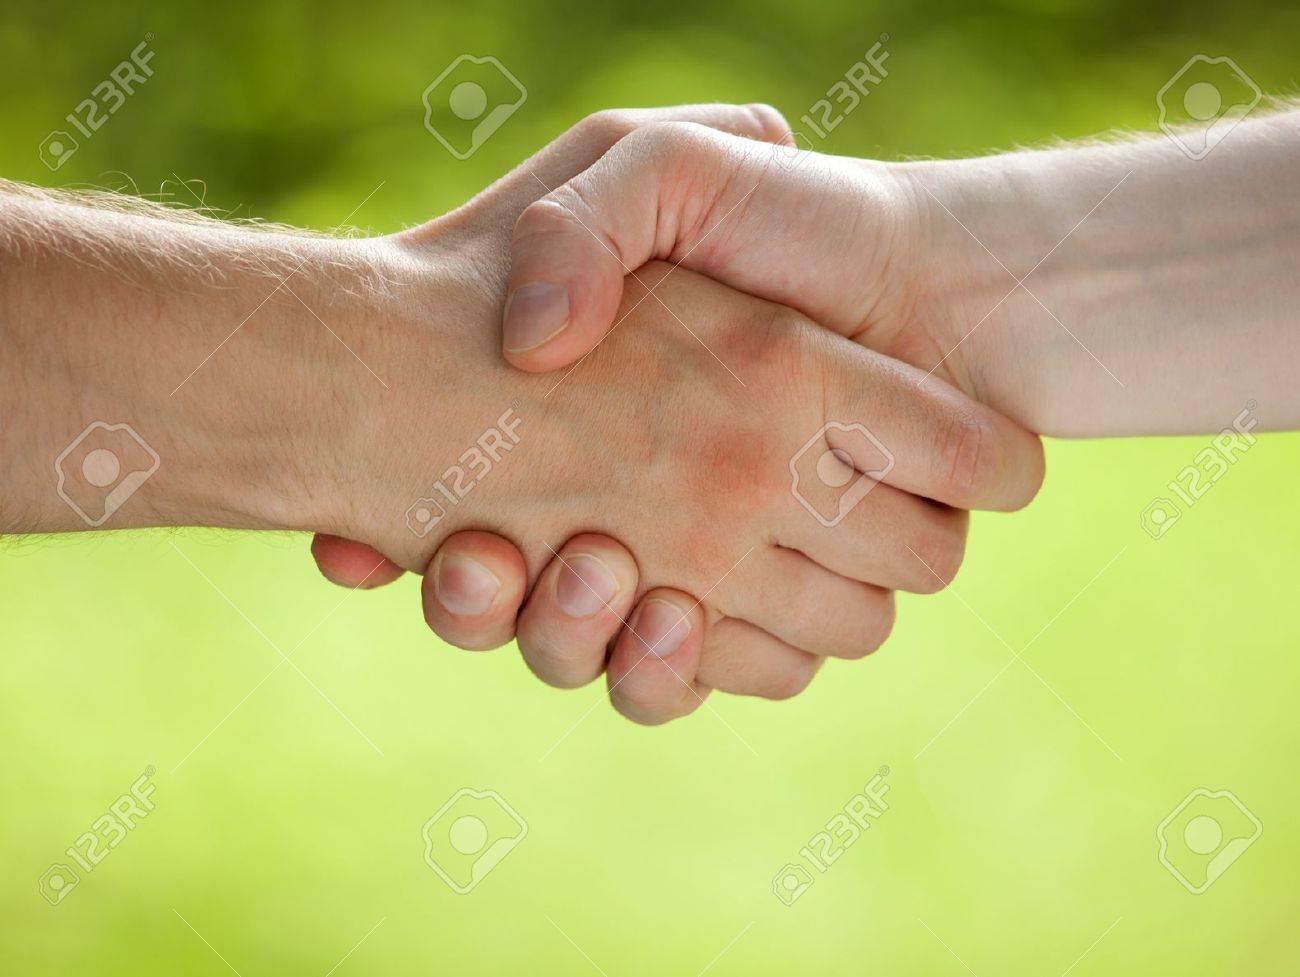 Handshake on light green eco background - 21320123